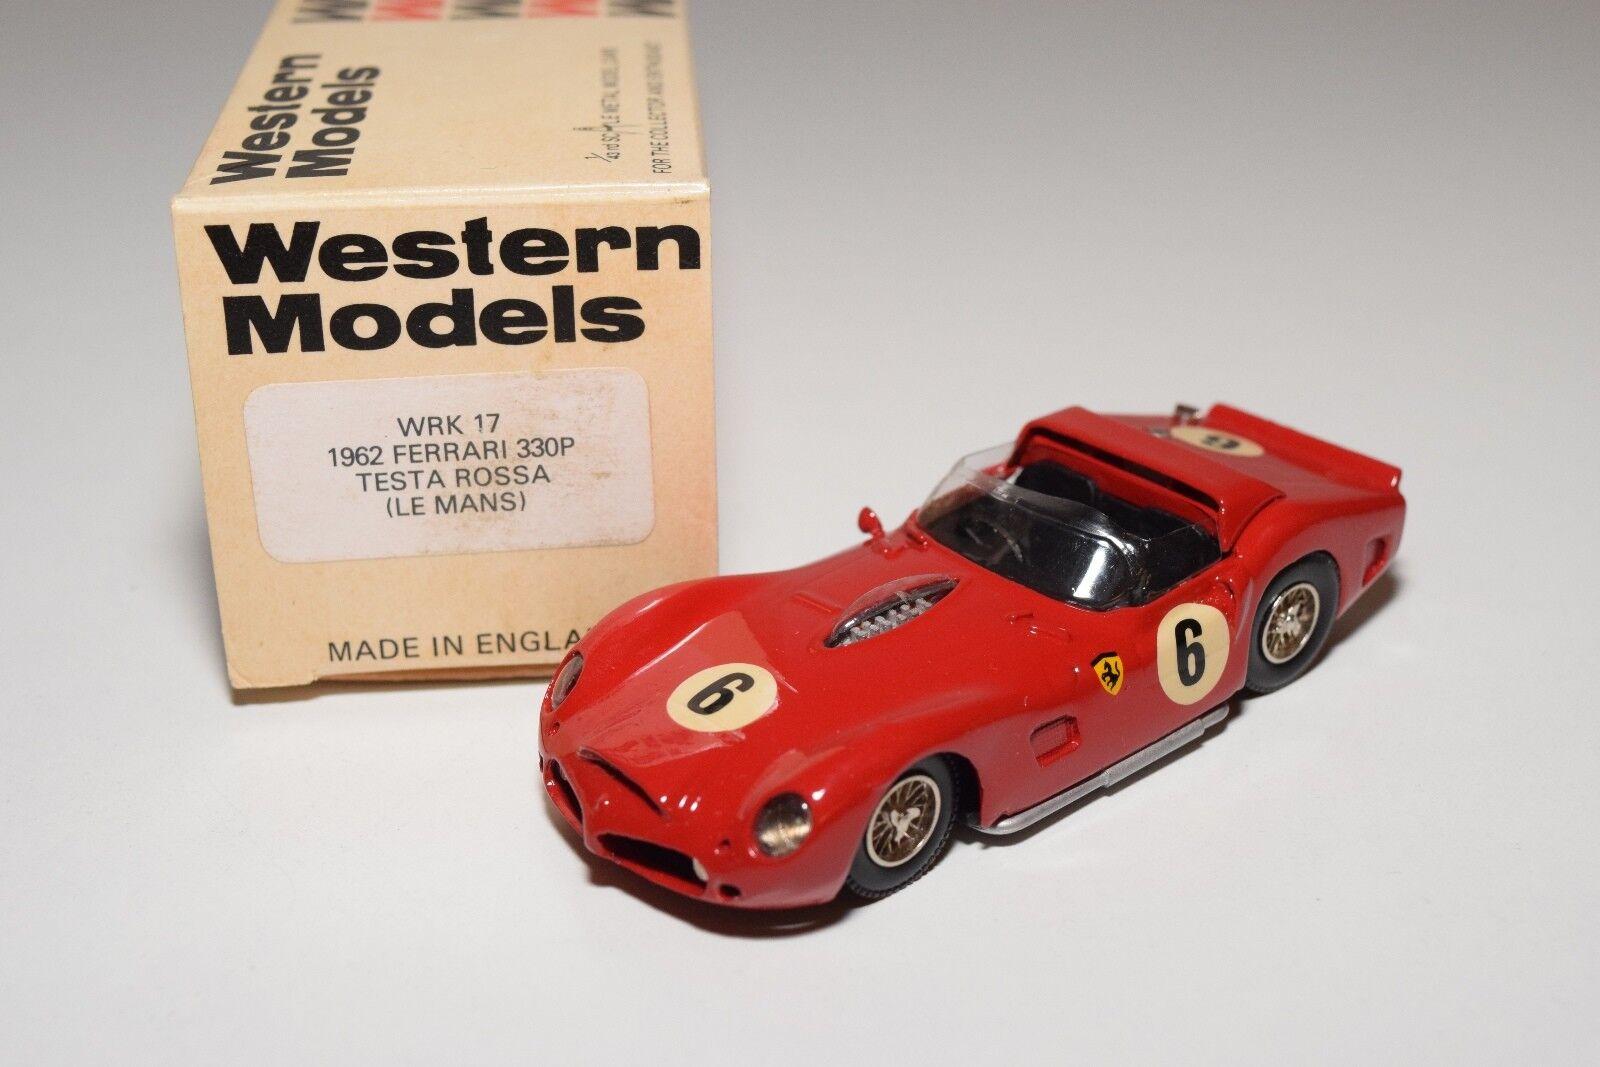 I I I WESTERN MODELS WM WRK 17 1962 FERRARI 330P TESTA ROSSA LE MANS RED MINT BOXED 8bf10f